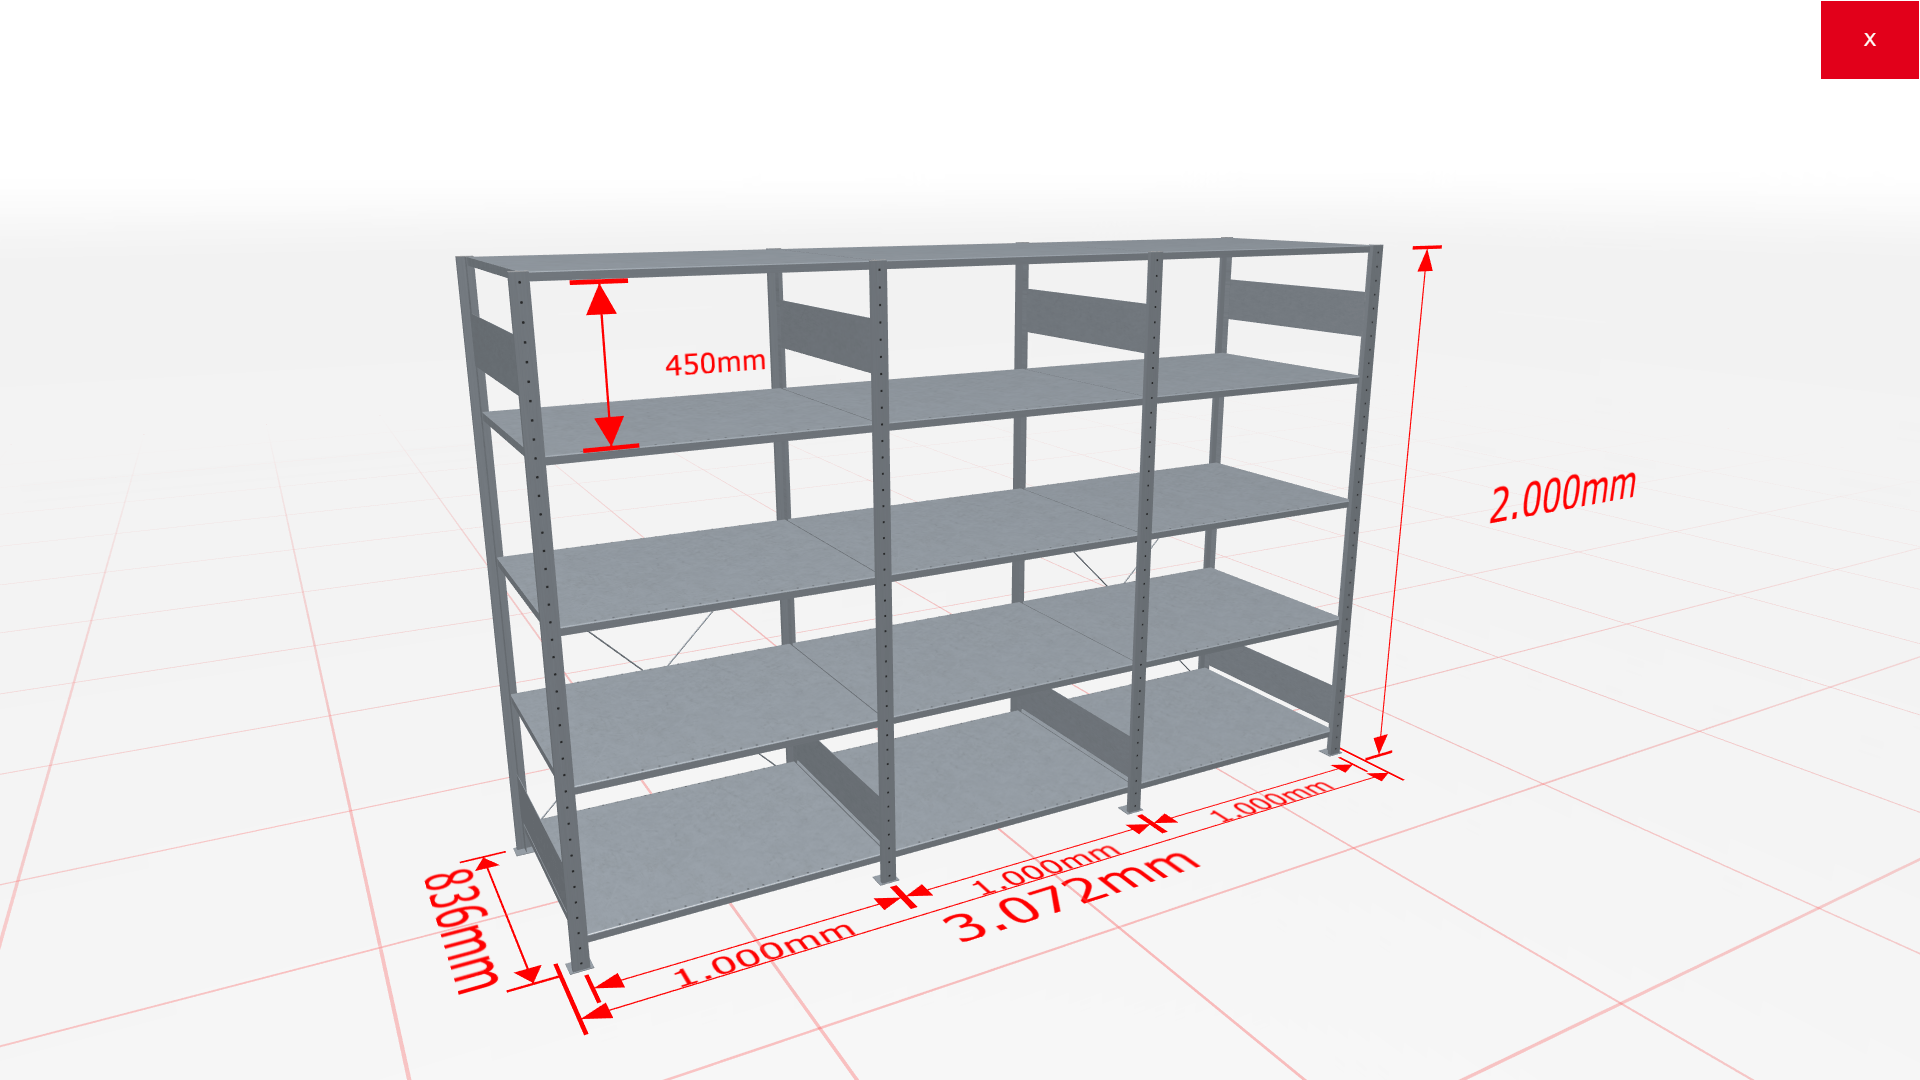 Fachbodenregal Komplettregal 2000x3072x800 mm (HxBxT) SCHULTE Lagertechnik verzinkt 5 Ebenen  150 kg je Boden